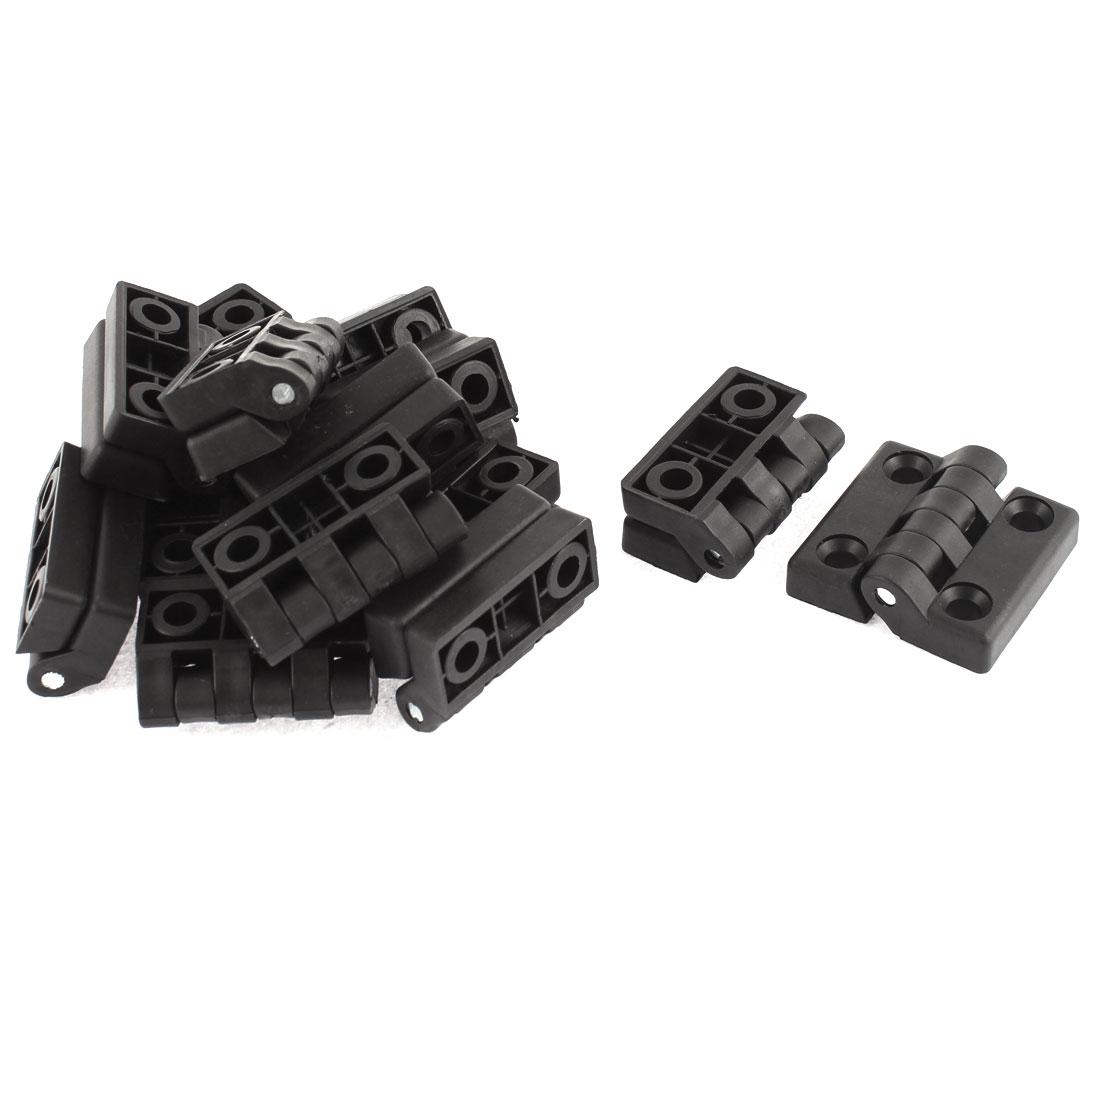 50mmx50mm 2 Leaves Plastic Door Bearing Butt Hinge Black 14pcs